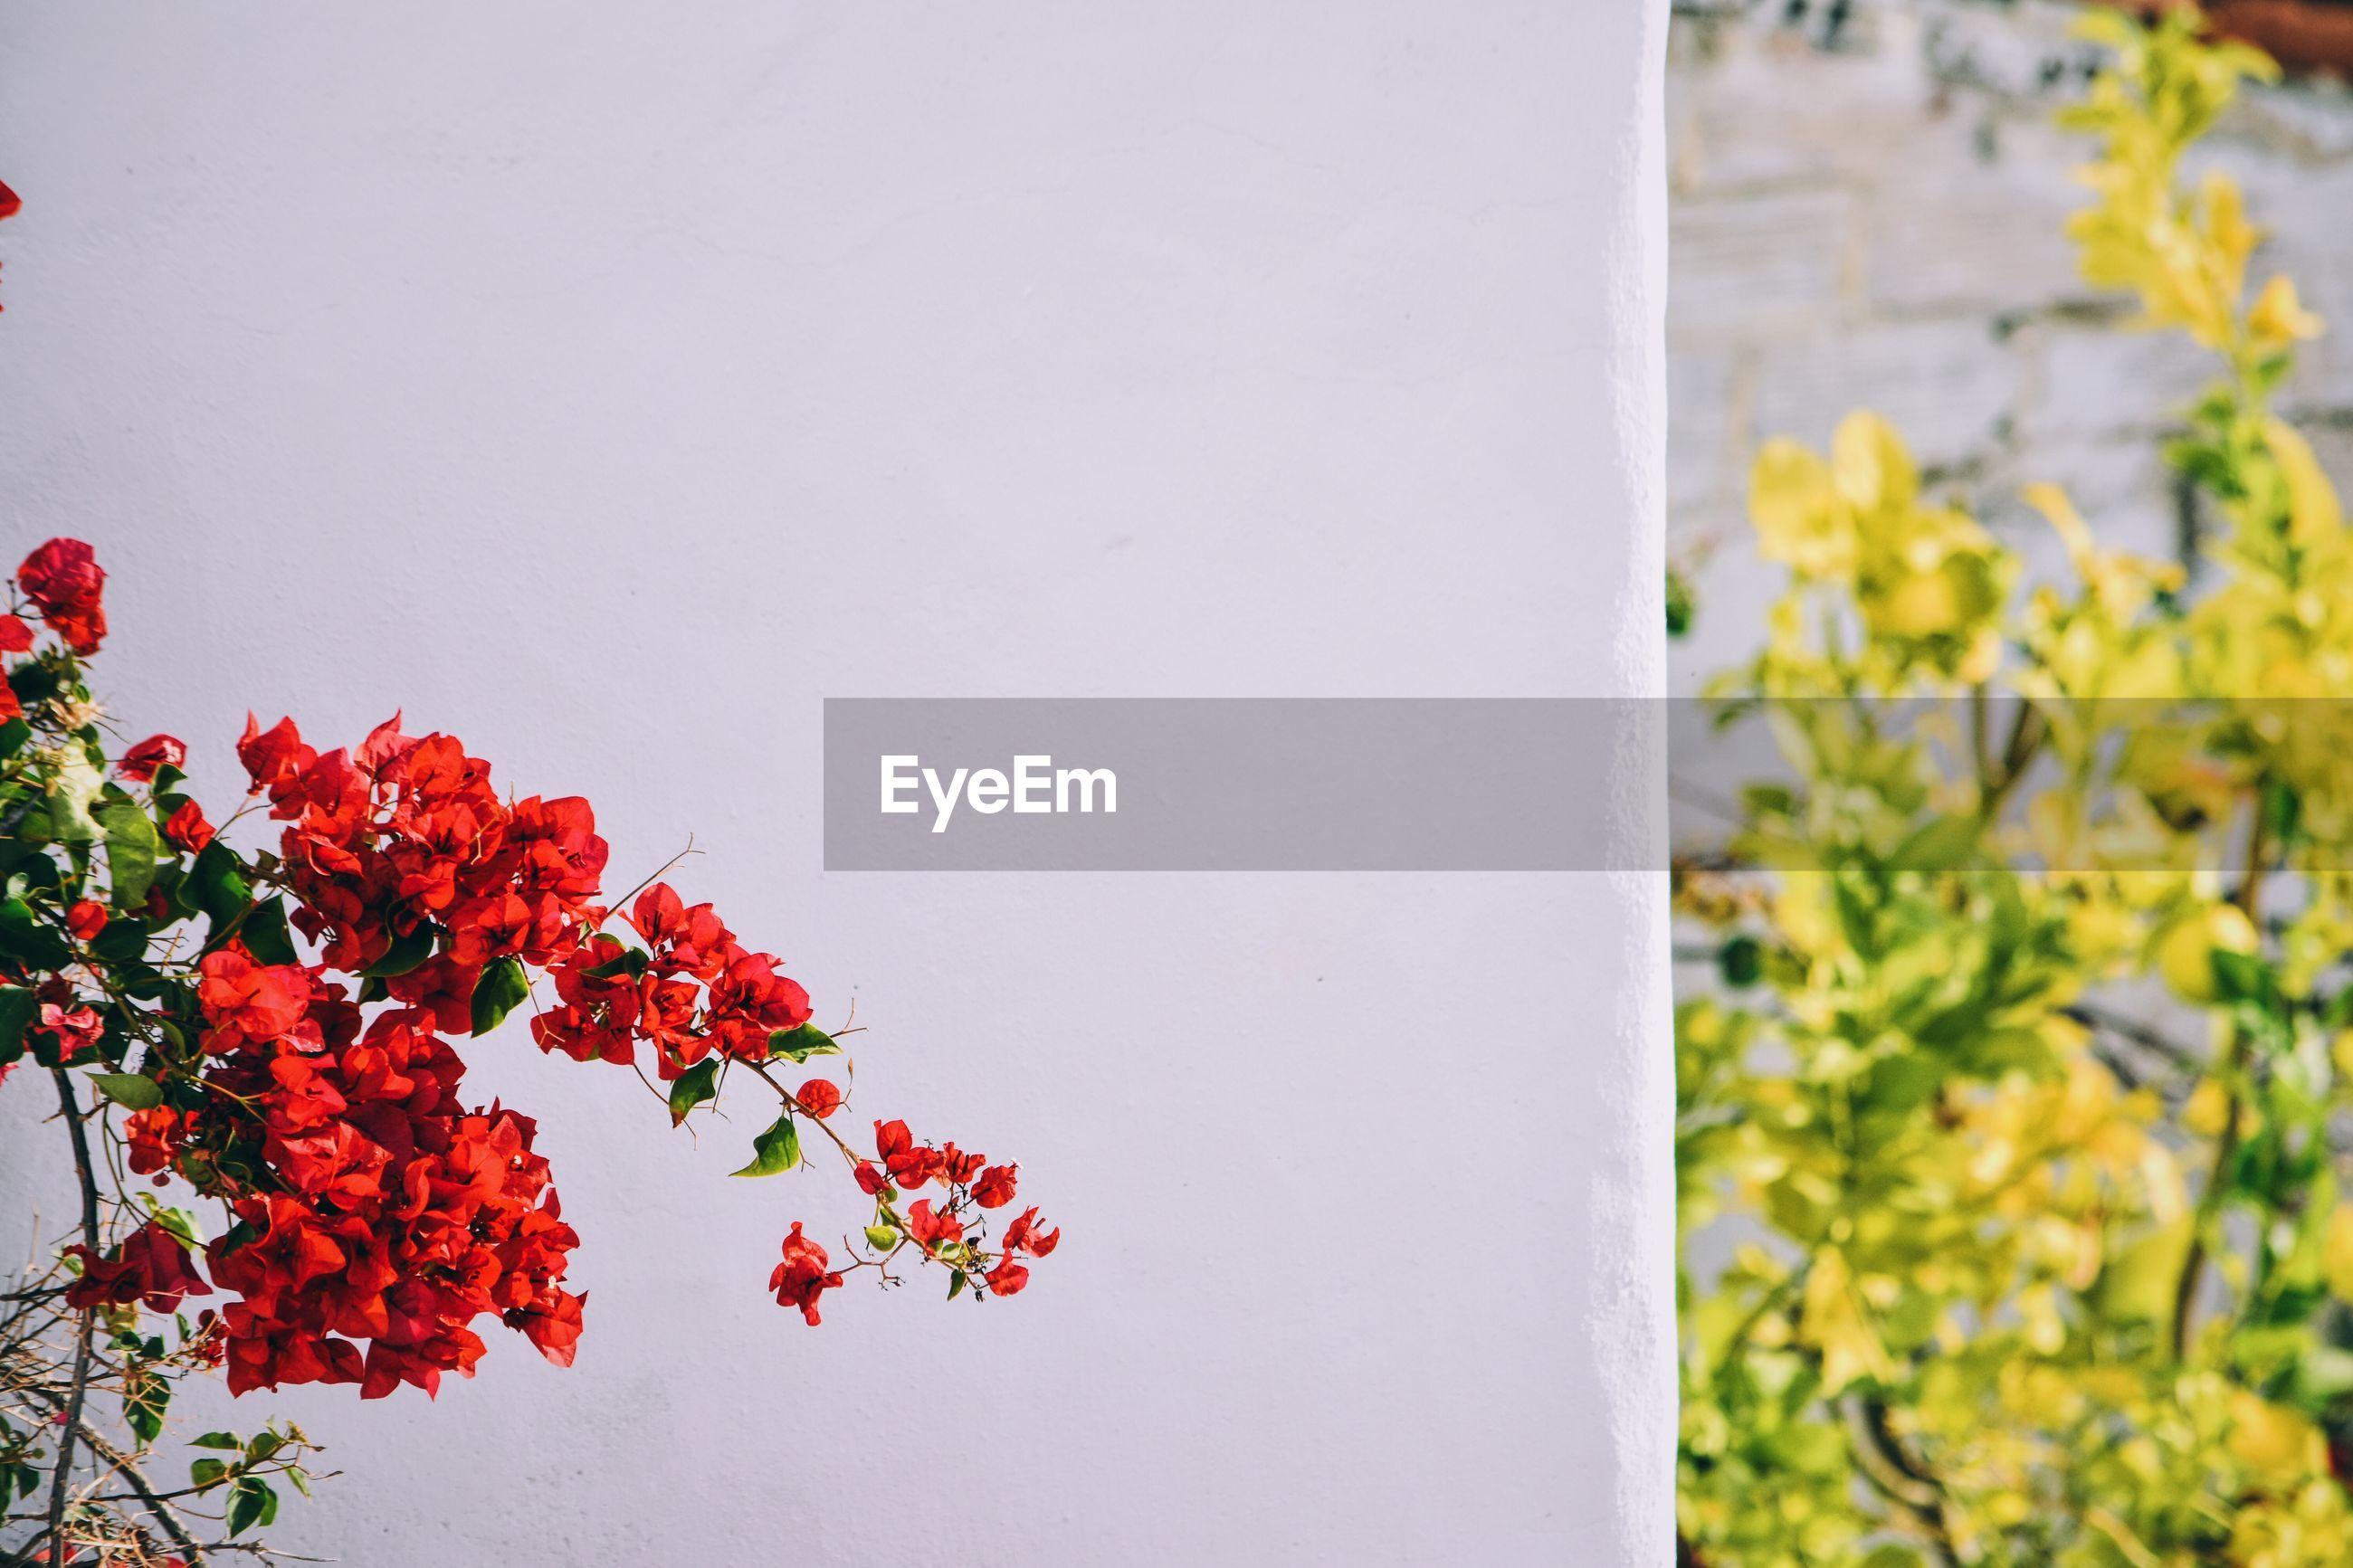 Red flowers blooming against column